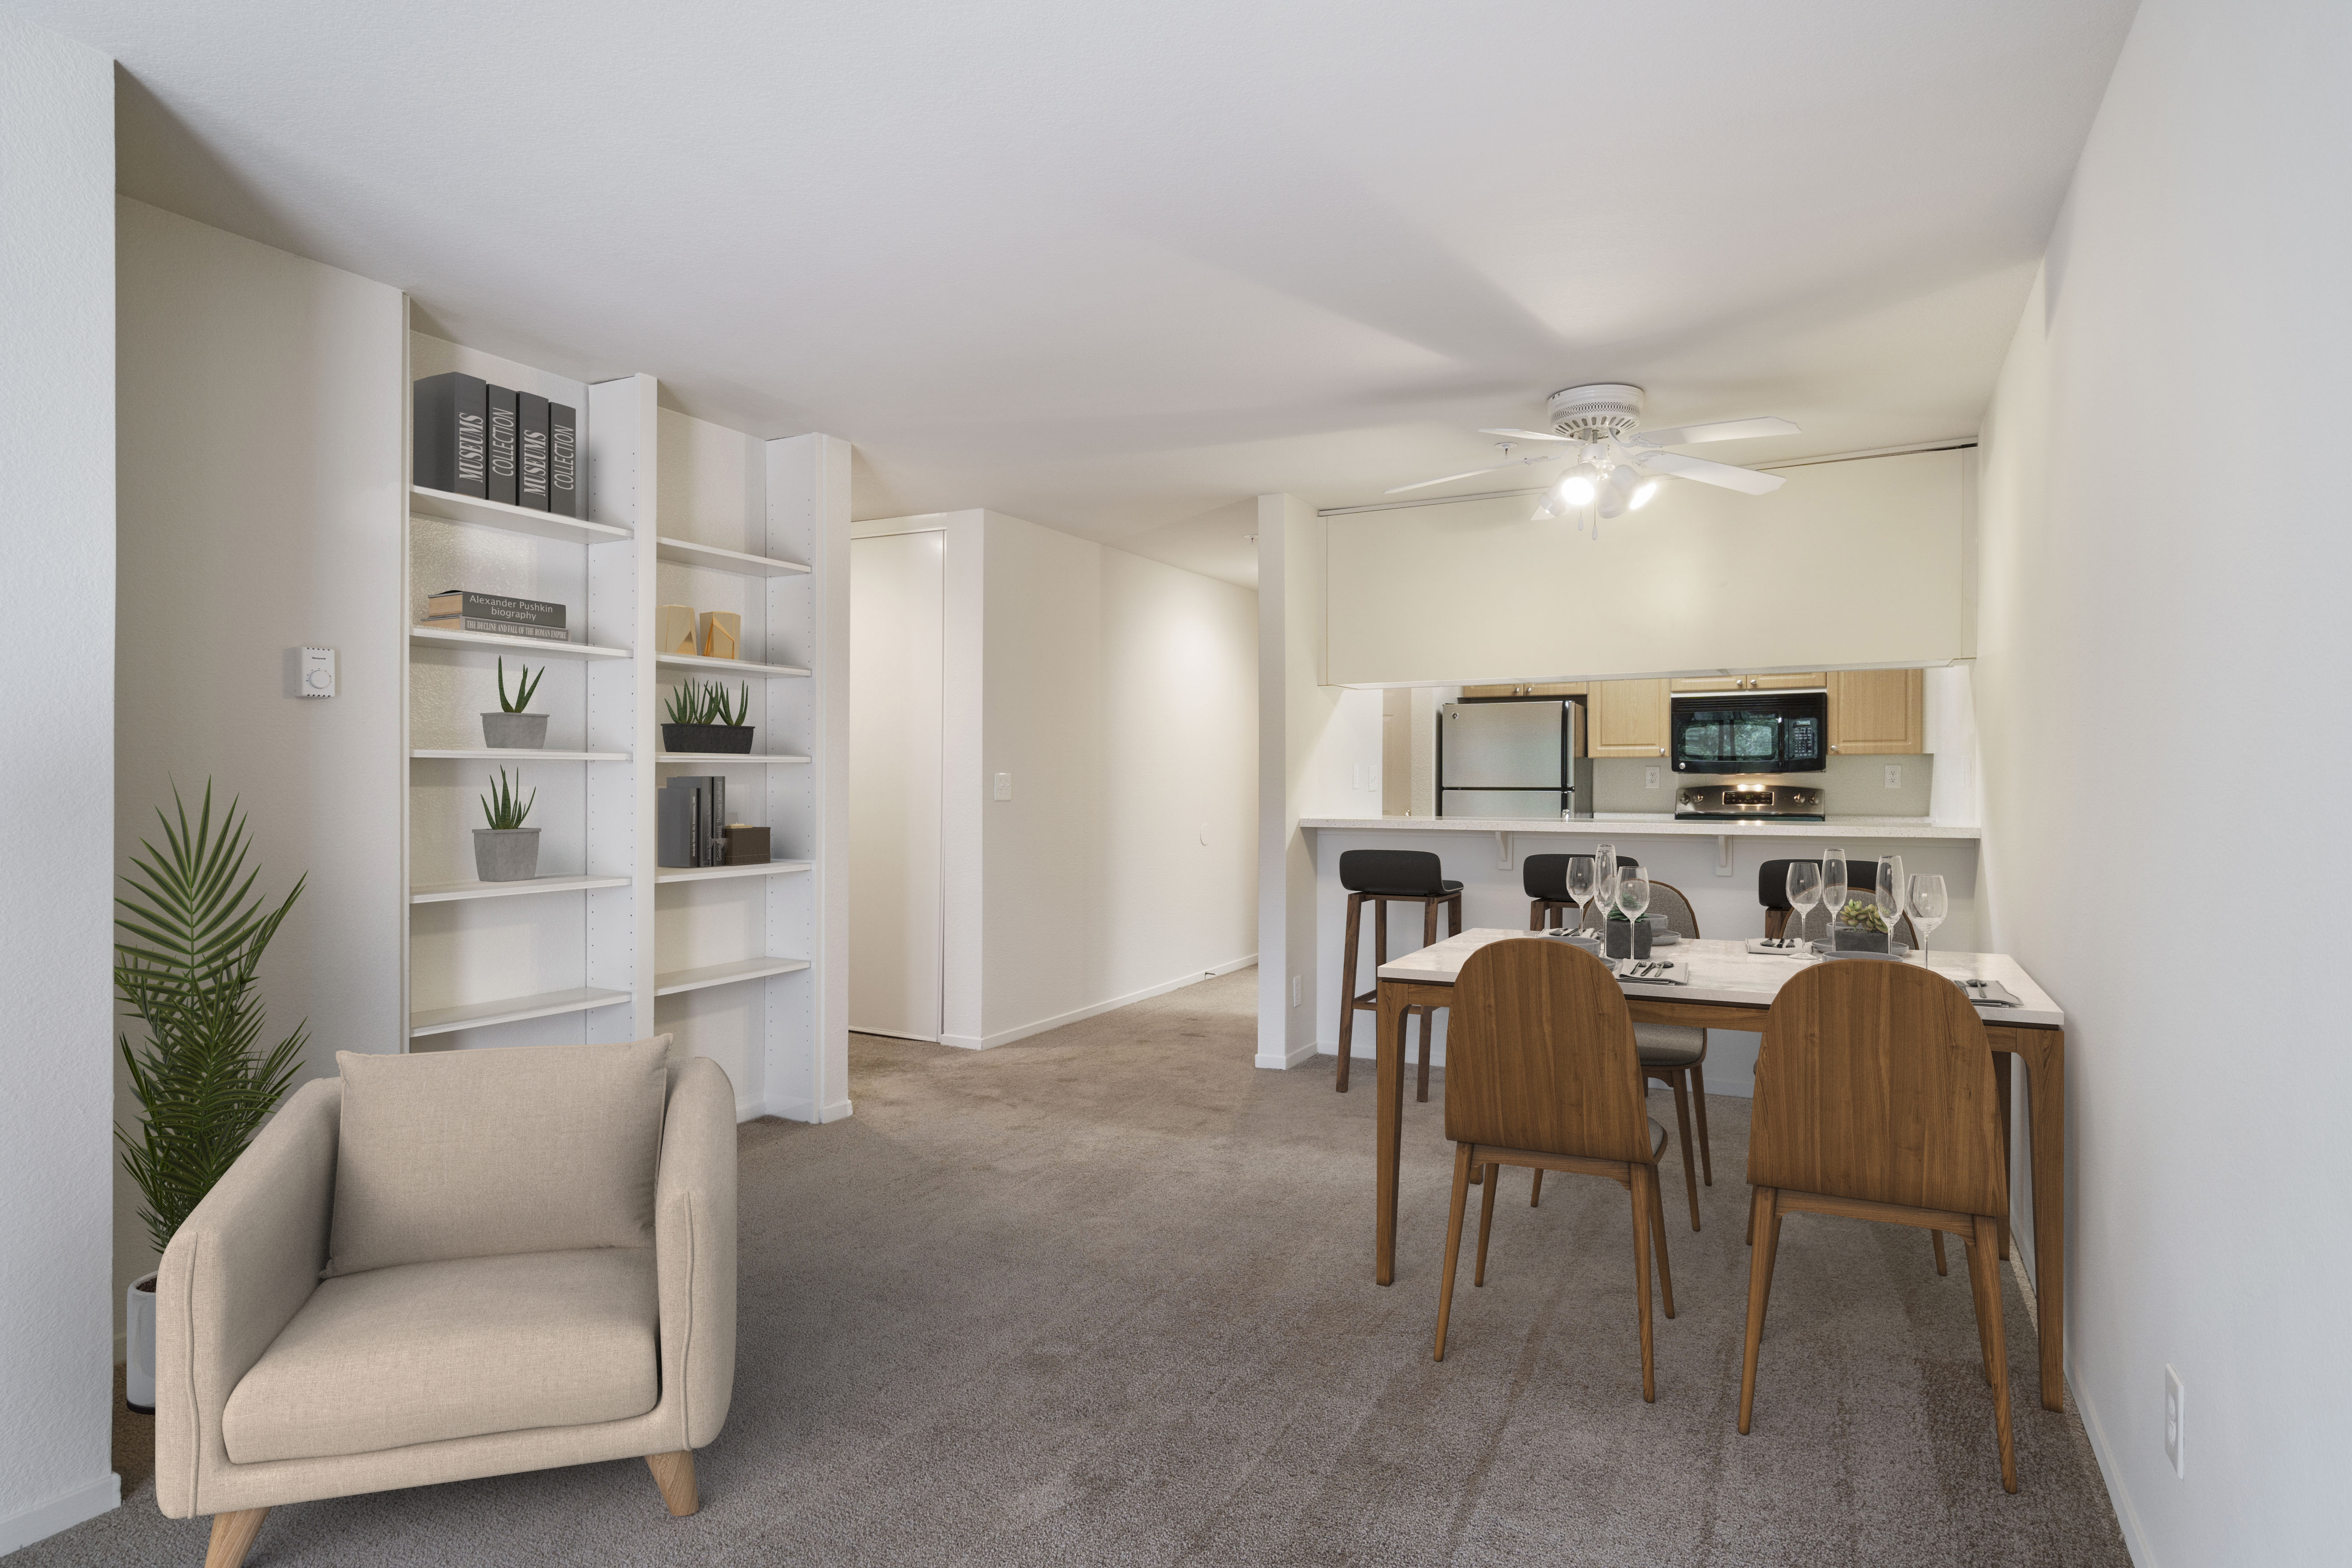 Woodside Apartments rental